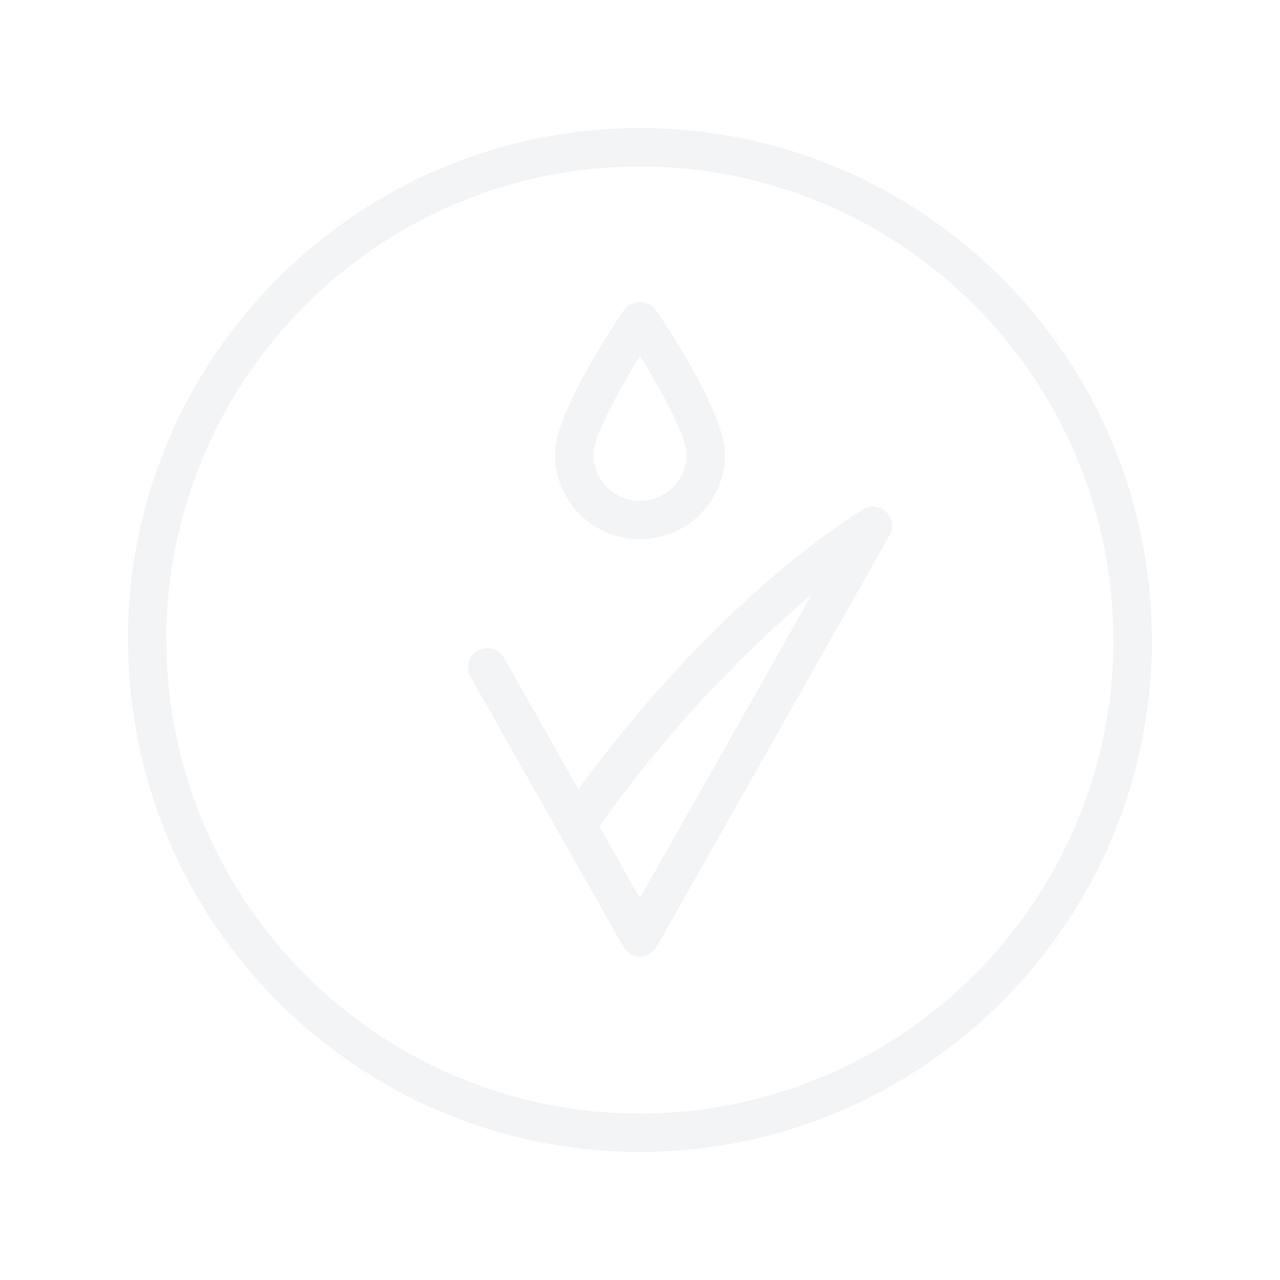 L'OREAL PROFESSIONNEL Powermix Warm Blonde Perfector 15ml